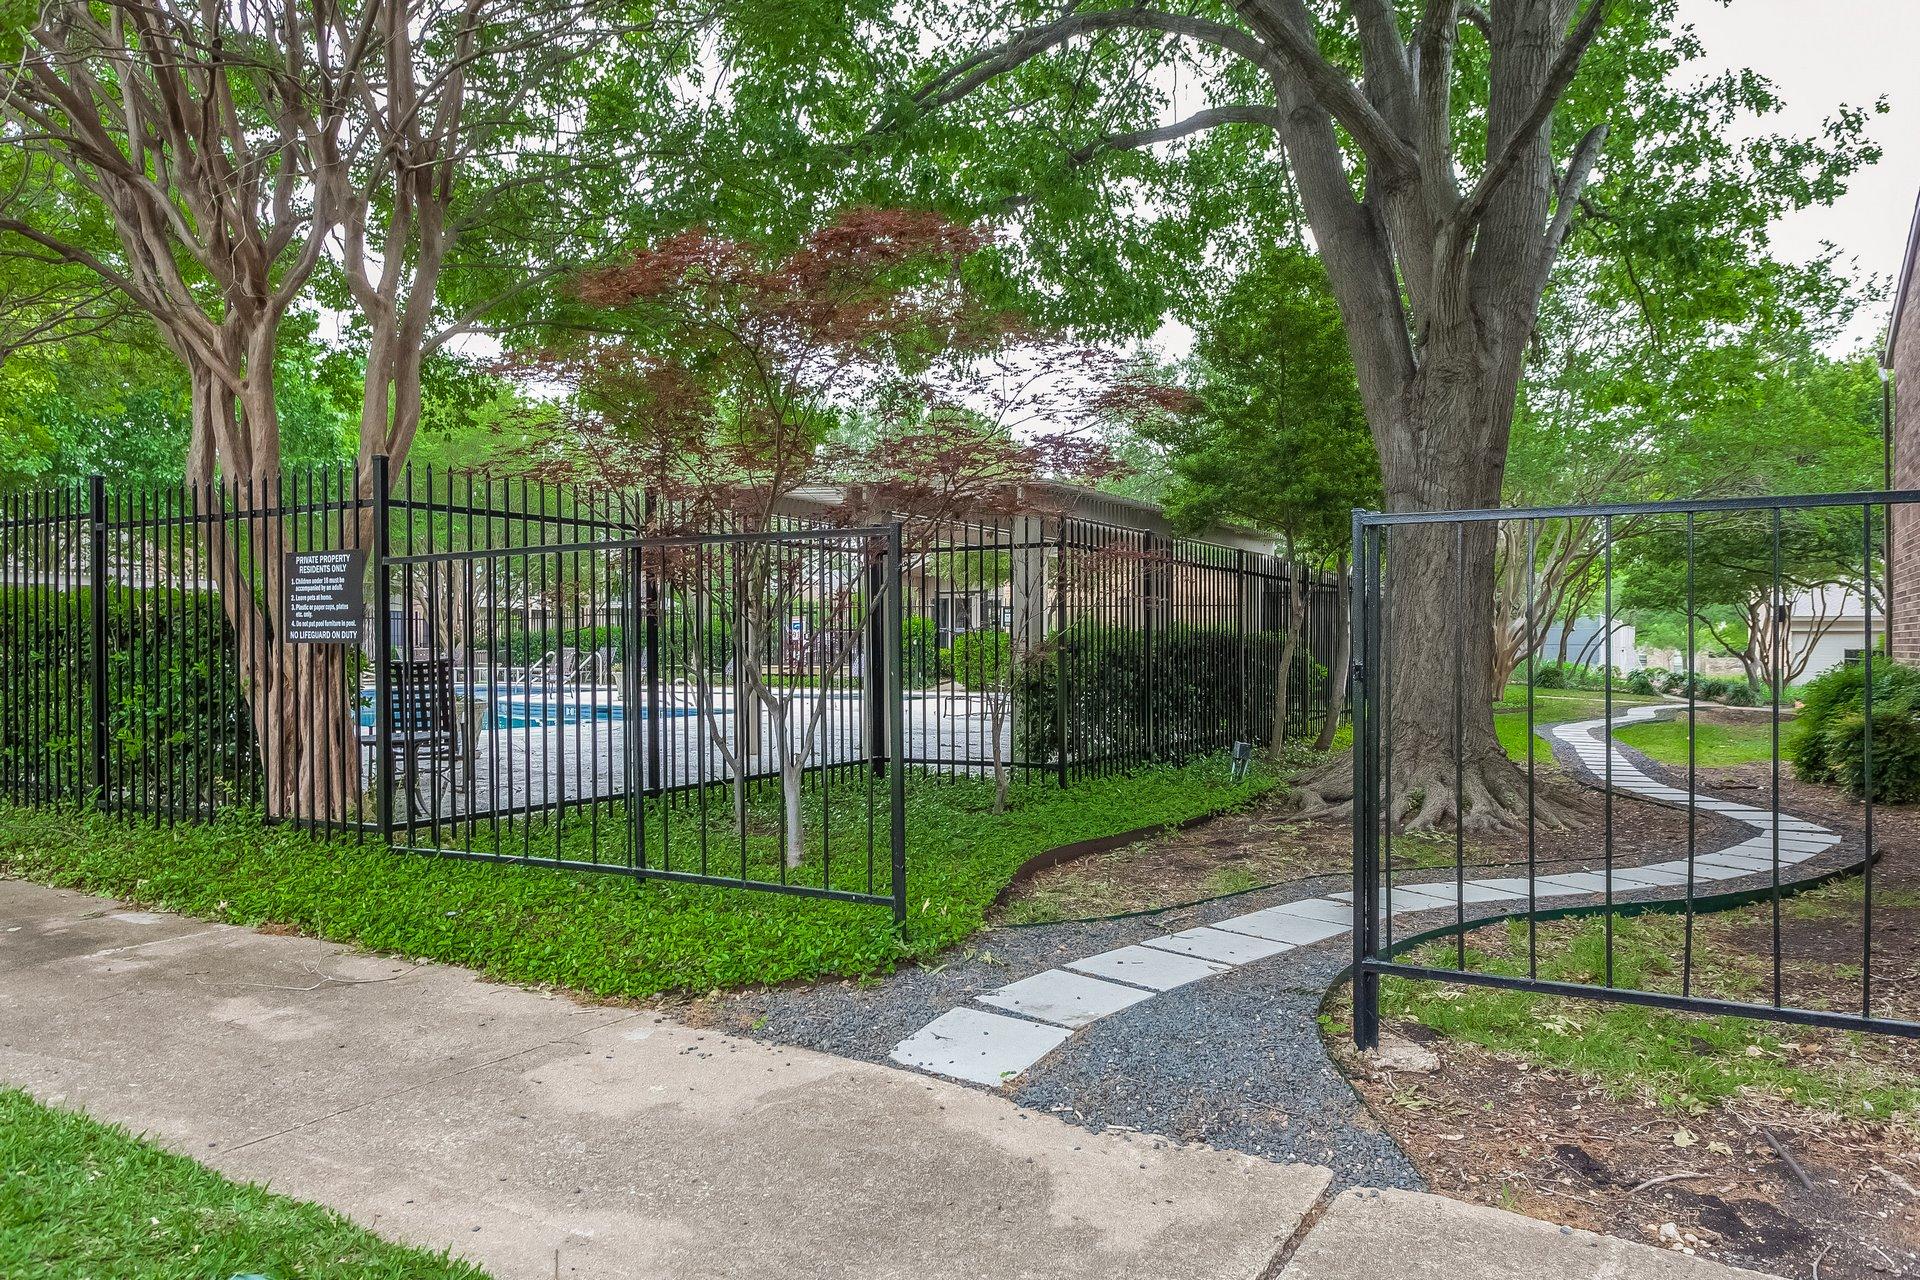 30 - 12598 Montego Plaza, Dallas TX 75230 Robert Jory Group.jpg